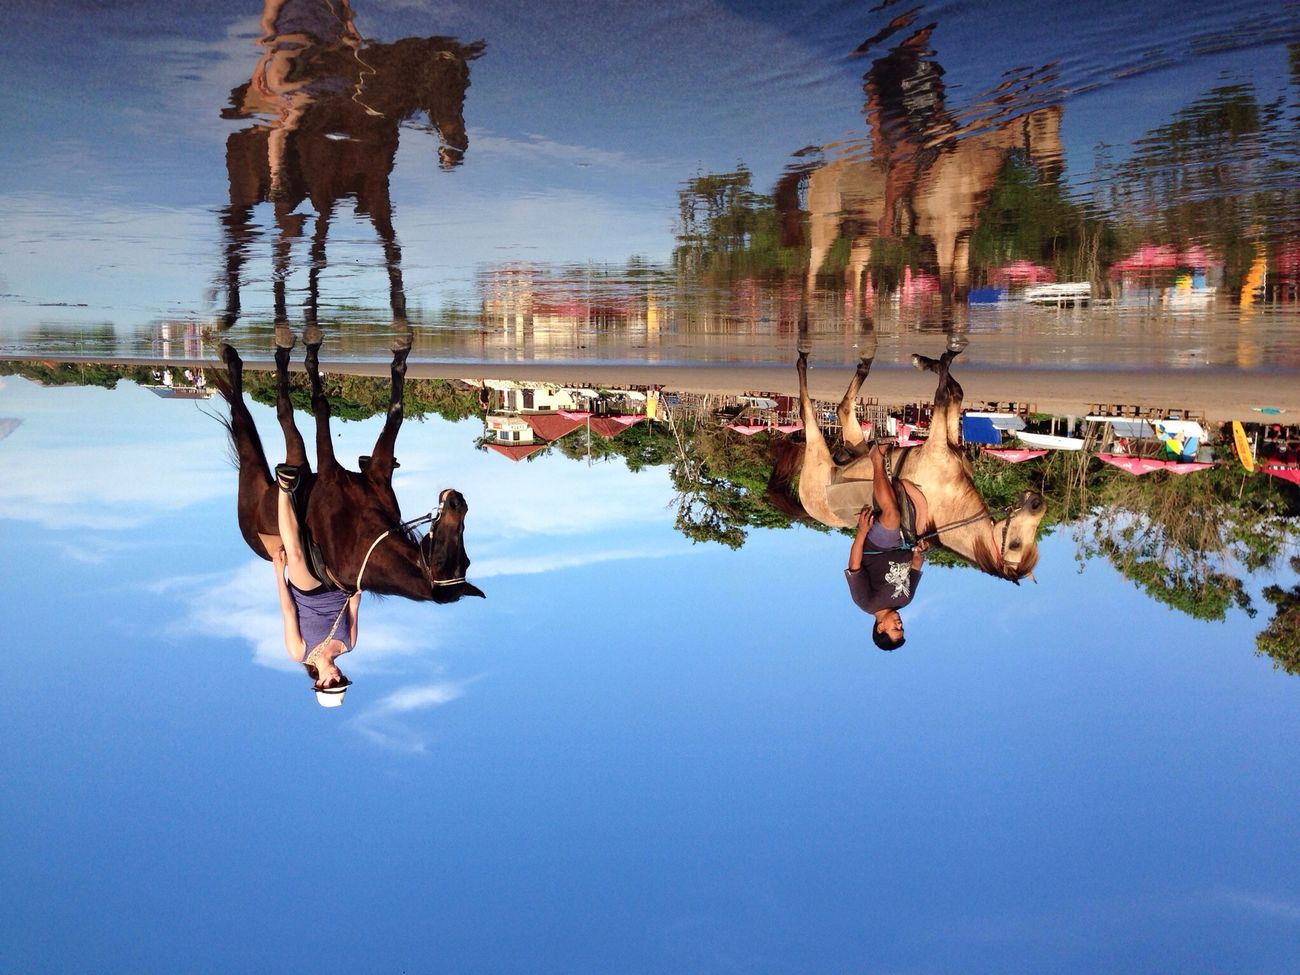 Upside down.... Reflection Mirror Upside Down